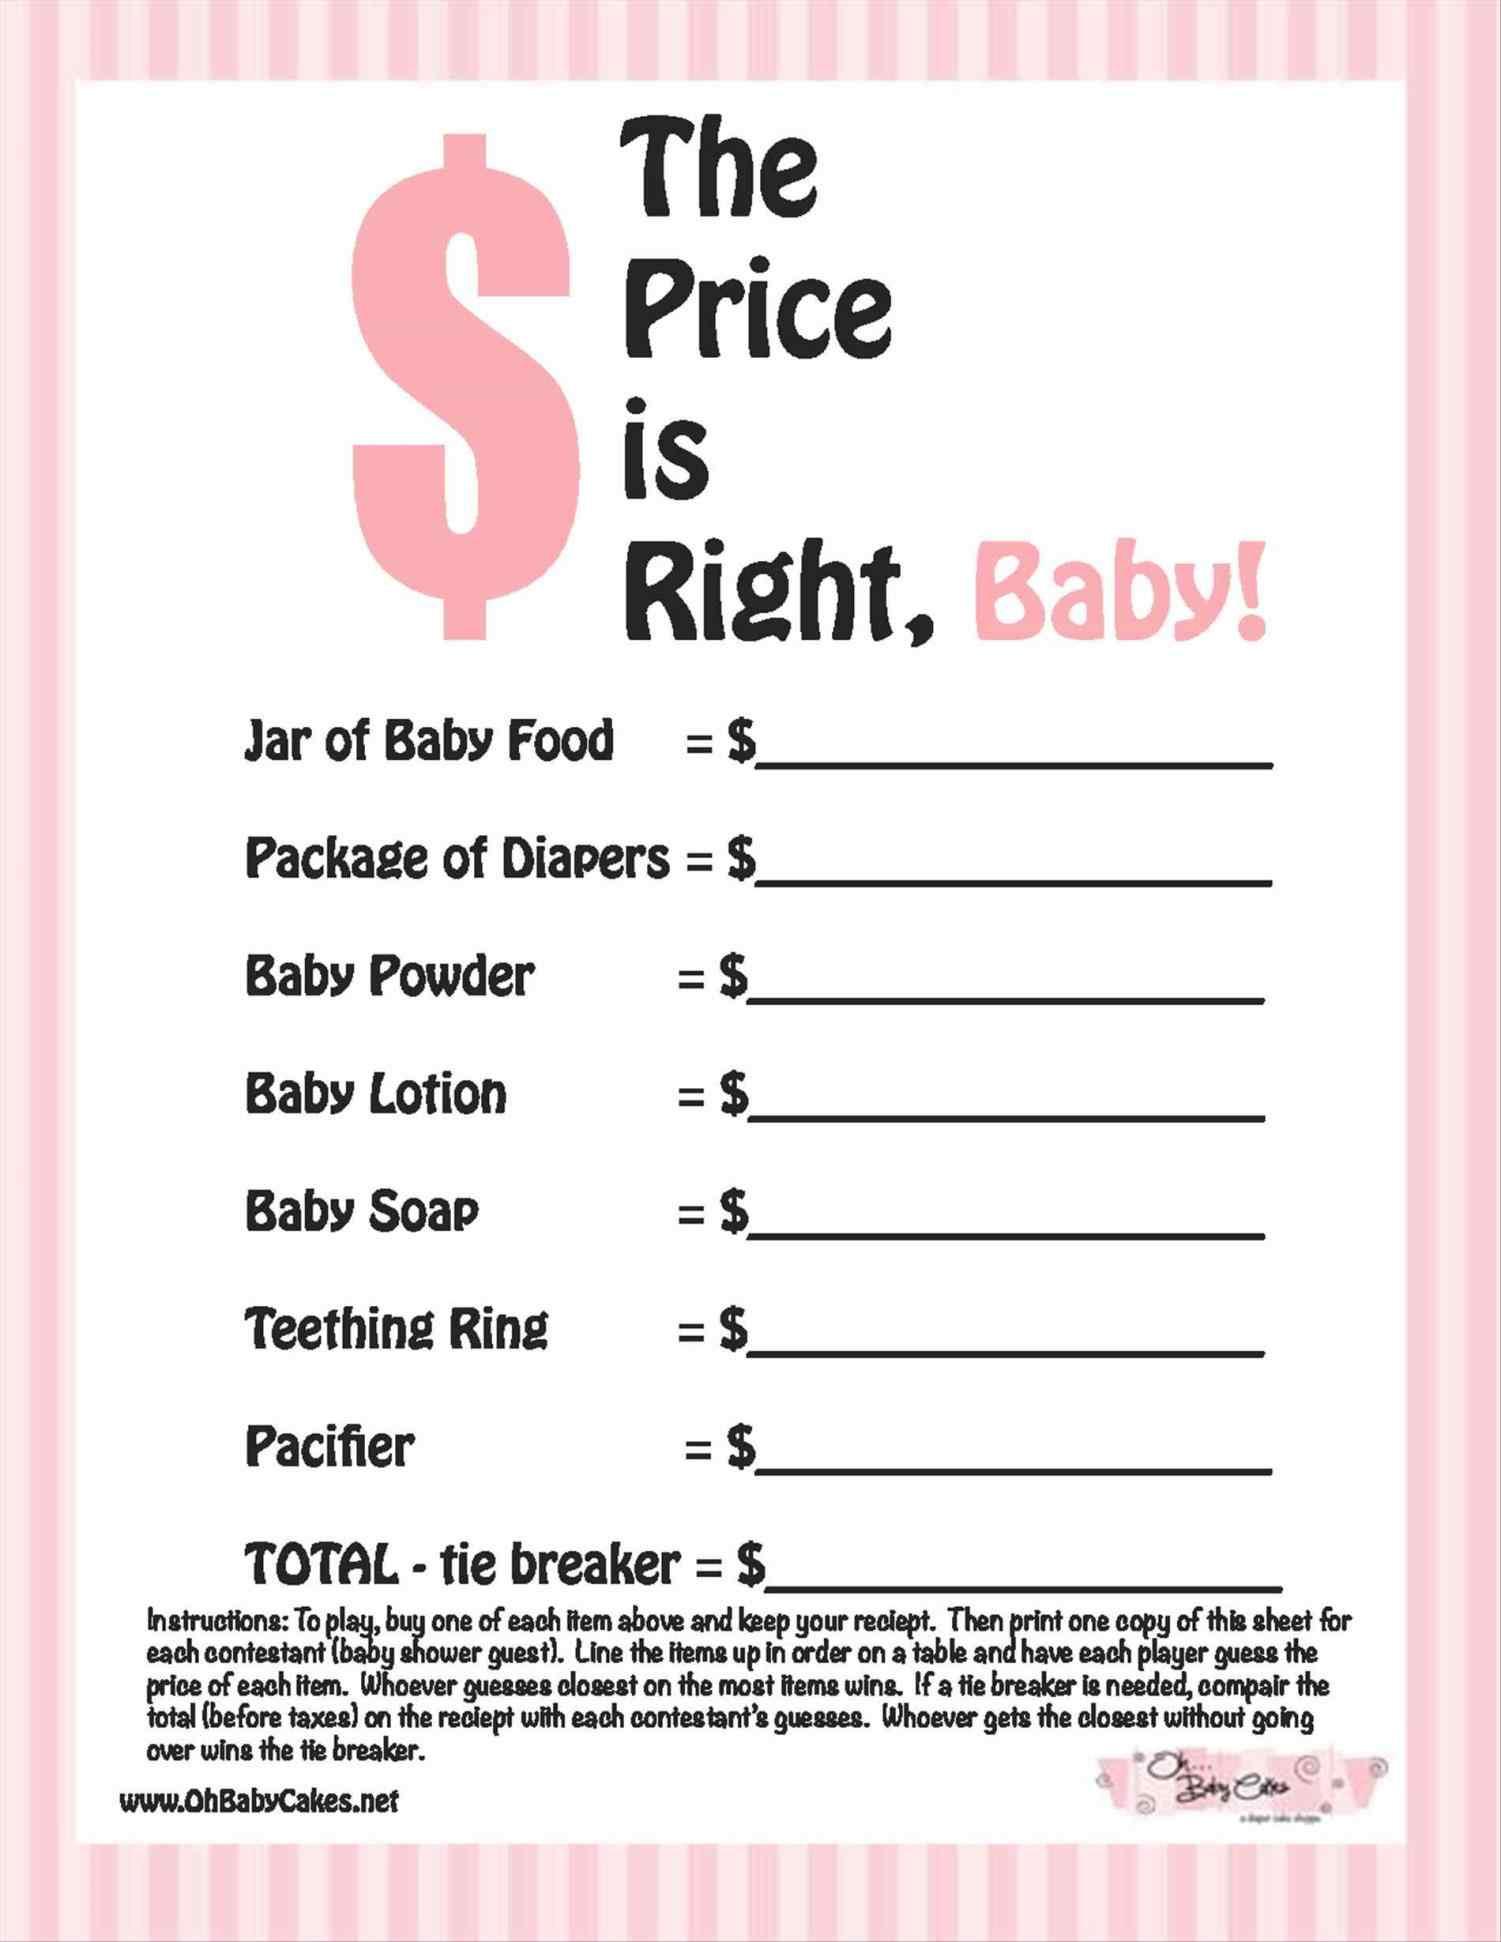 Crosswords Wedding Crossword Puzzle Printable Free Baby Shower Games - Printable Crossword Puzzles For Baby Shower